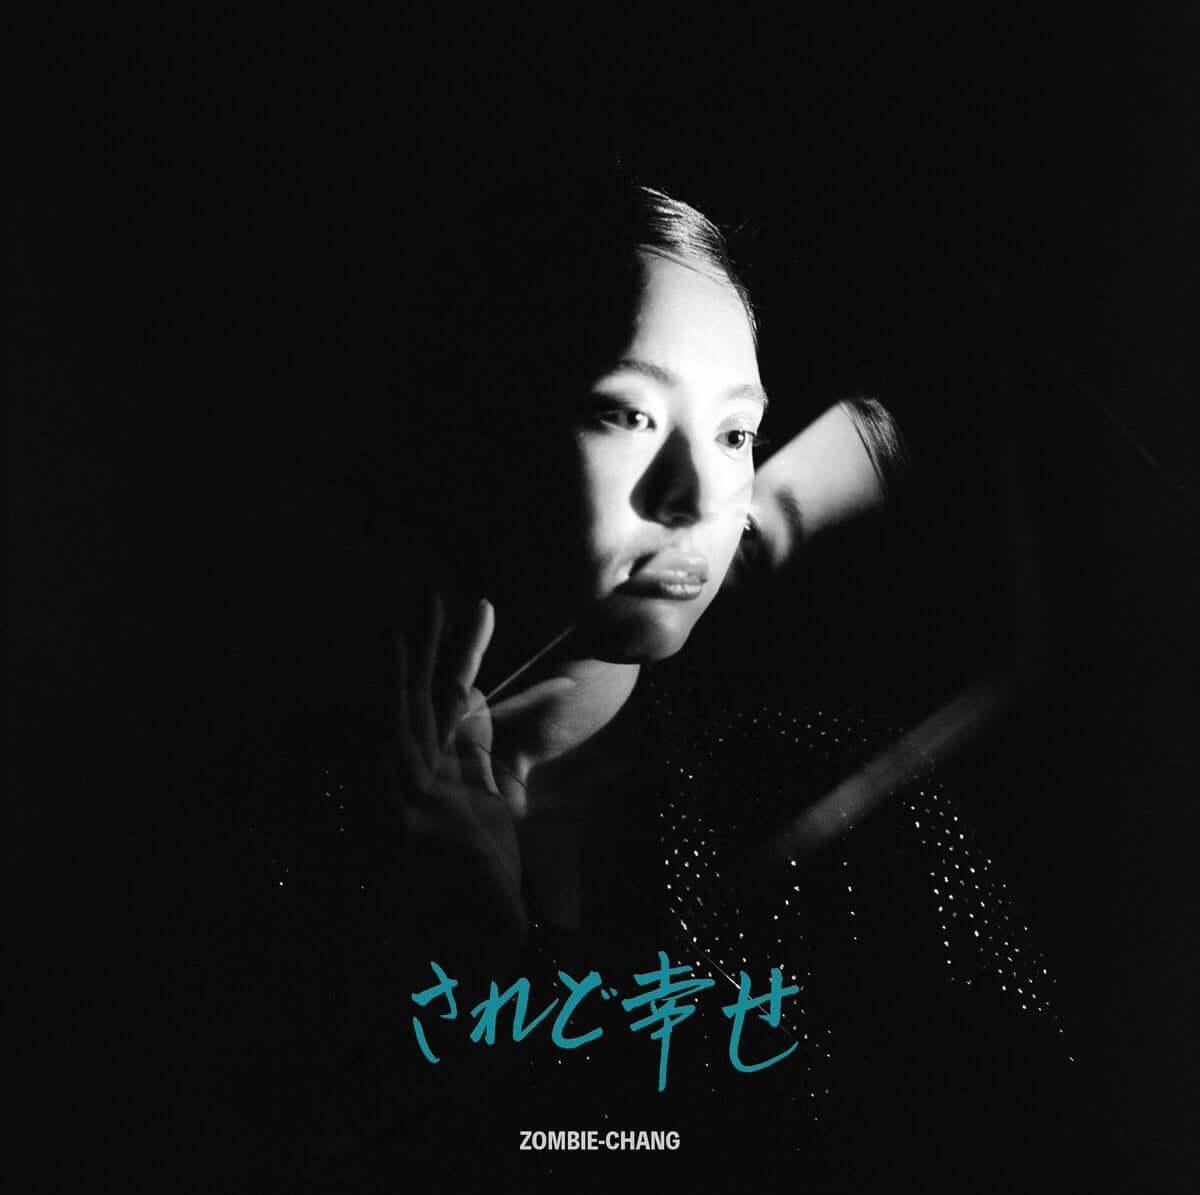 ZOMBIE-CHANGの新EP『されど幸せ』がリリース|山田智和が手掛ける表題曲のMVも公開 music190401-zombie-chang-3-1200x1195